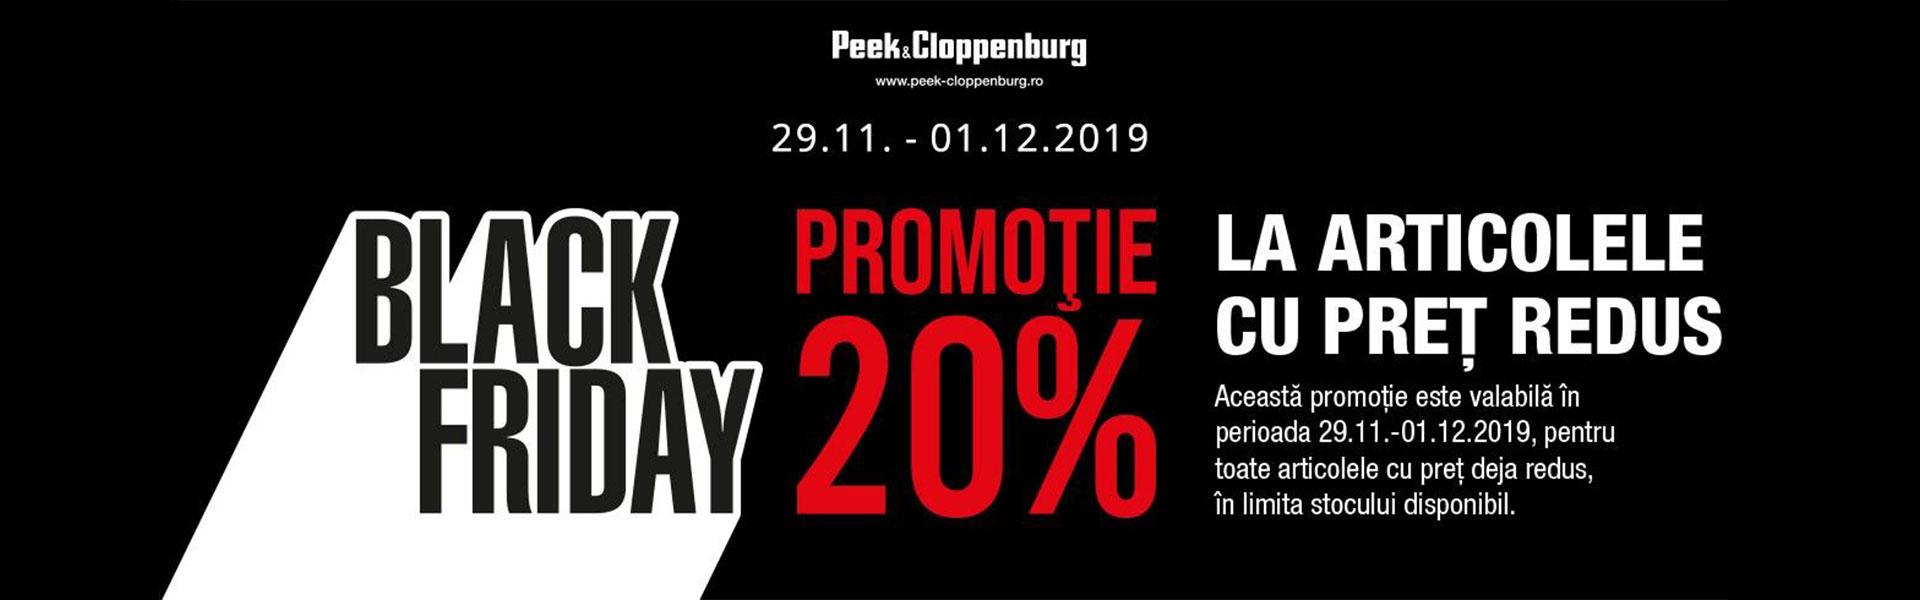 Peek Cloppenburg Black Friday